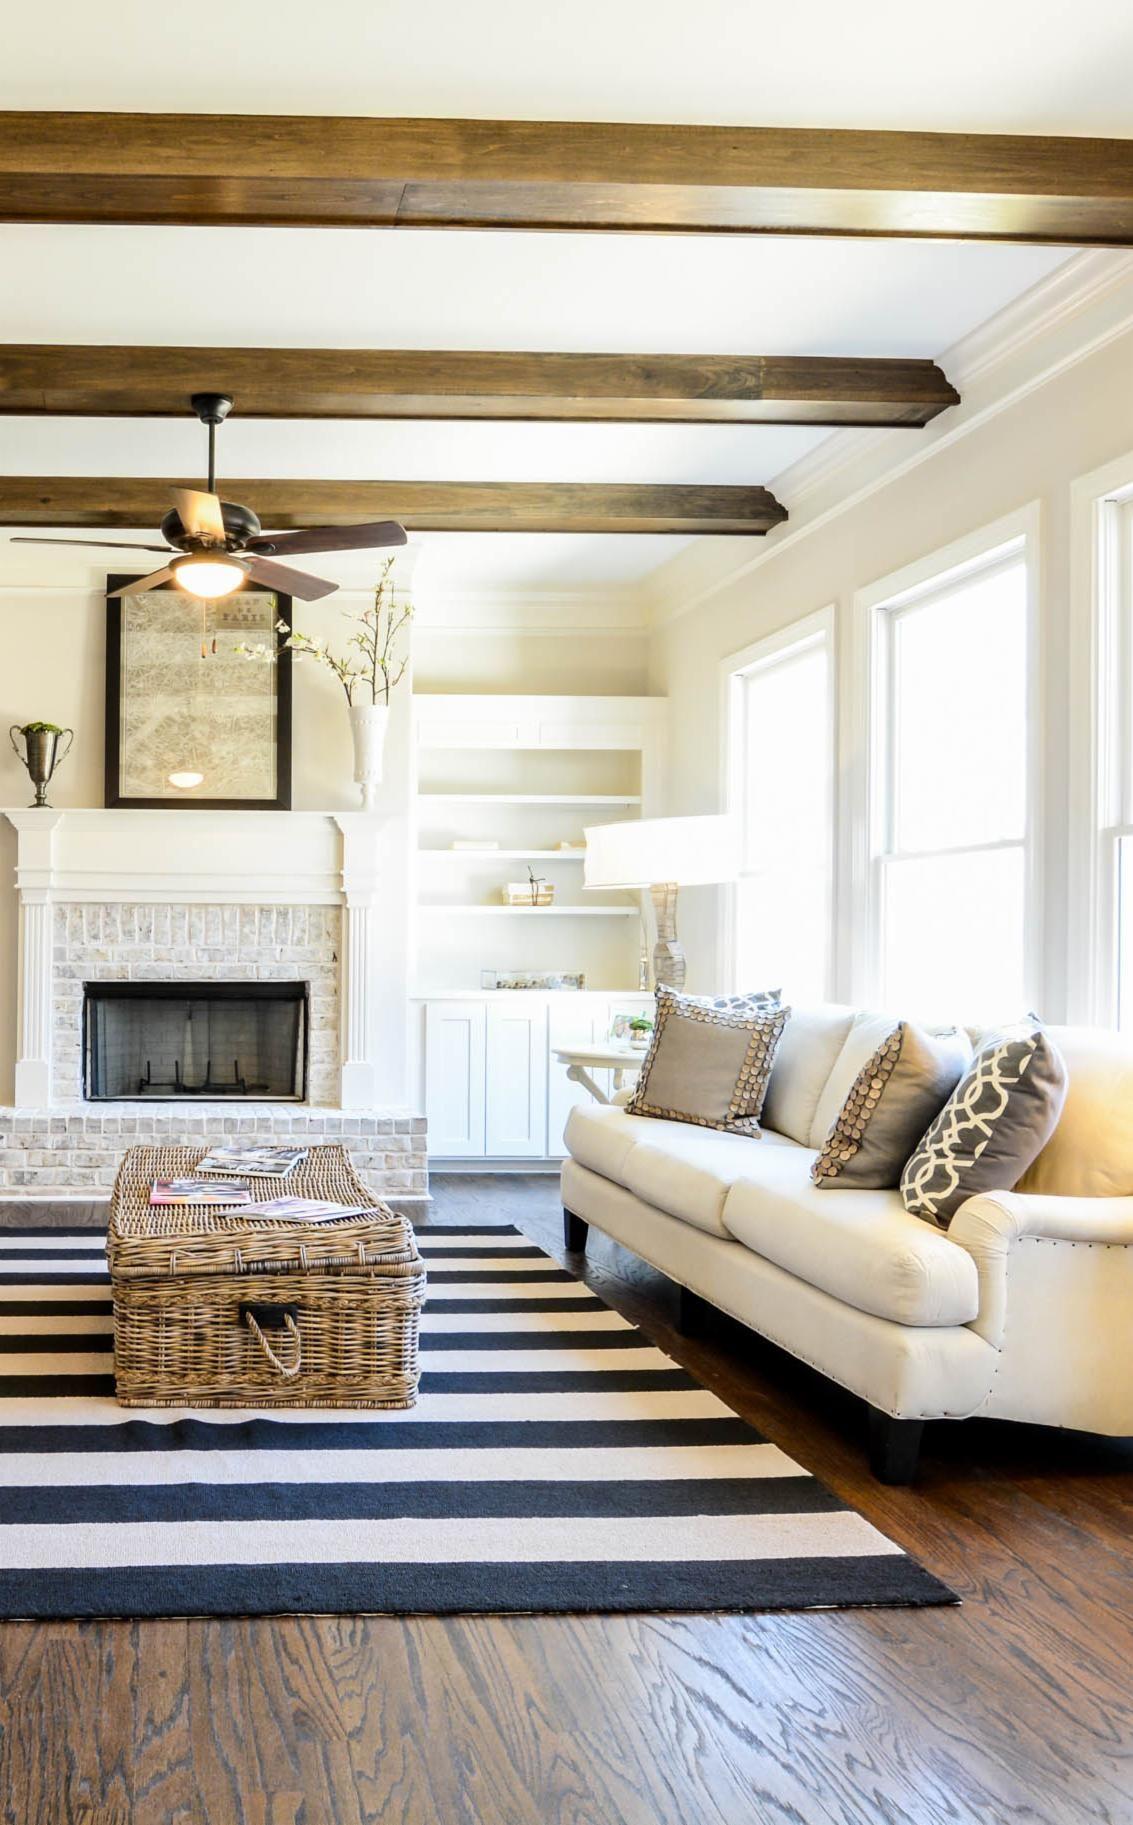 Beautiful hardwood floors and wooden beams give